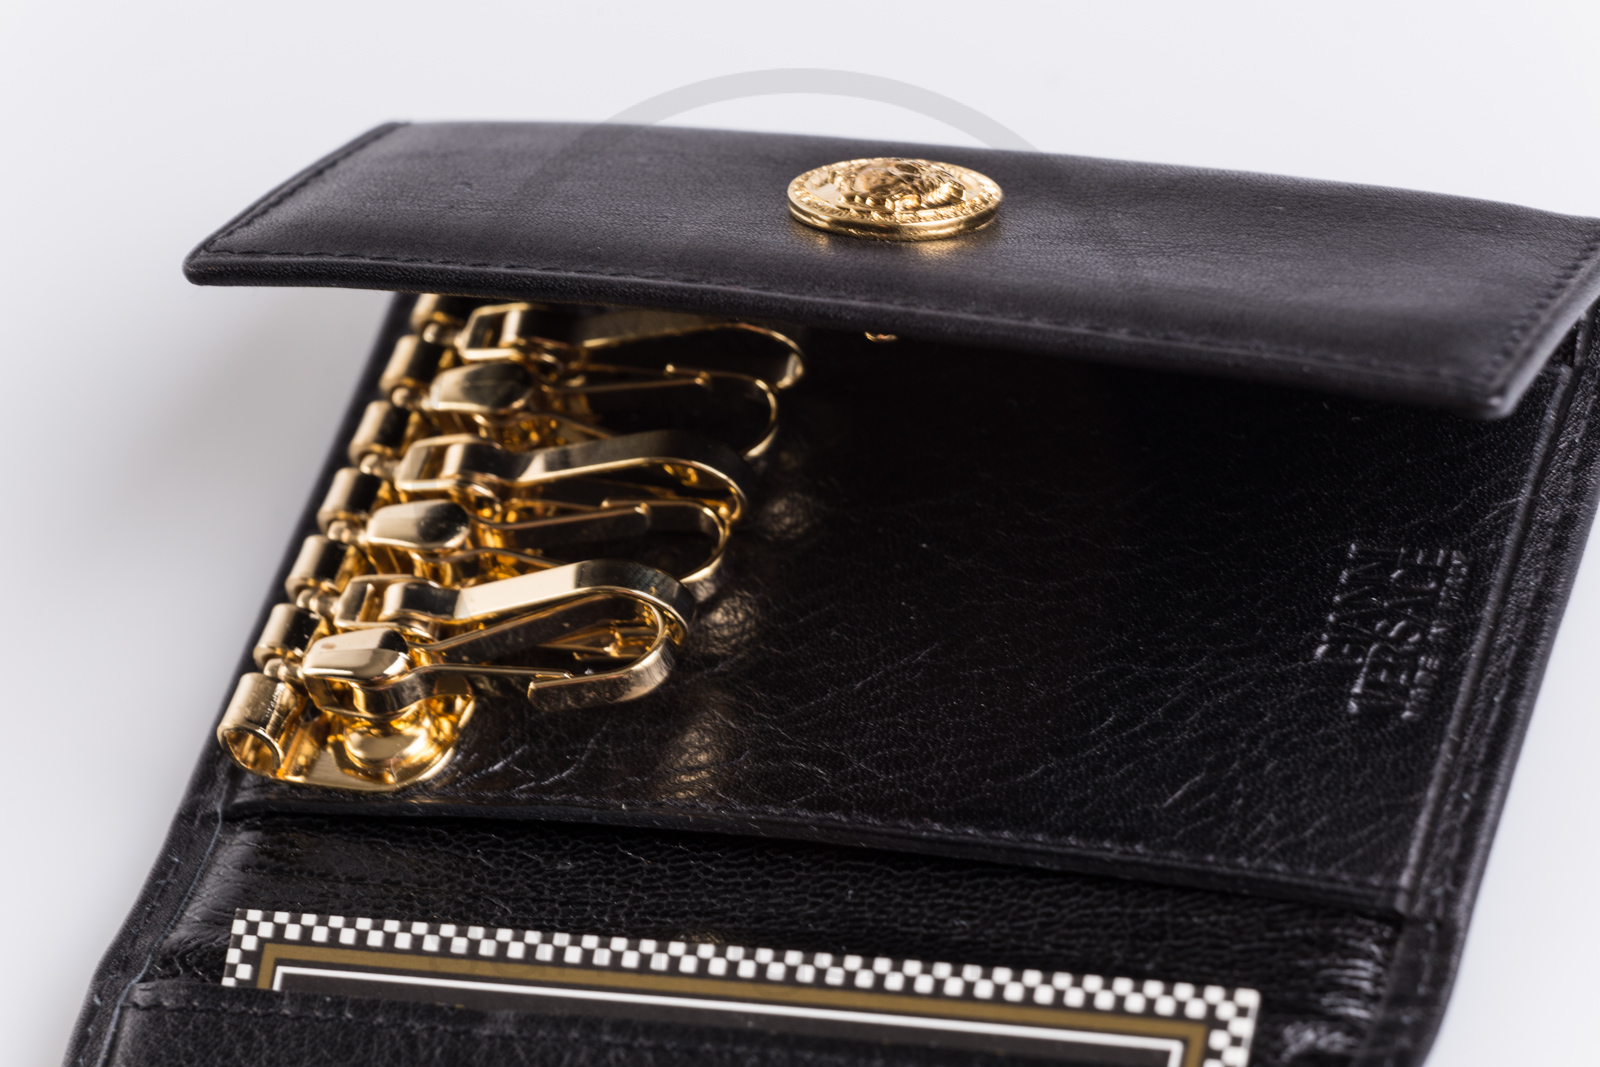 Gianni Versace Key Wallet Sammy Amp Nino S Store